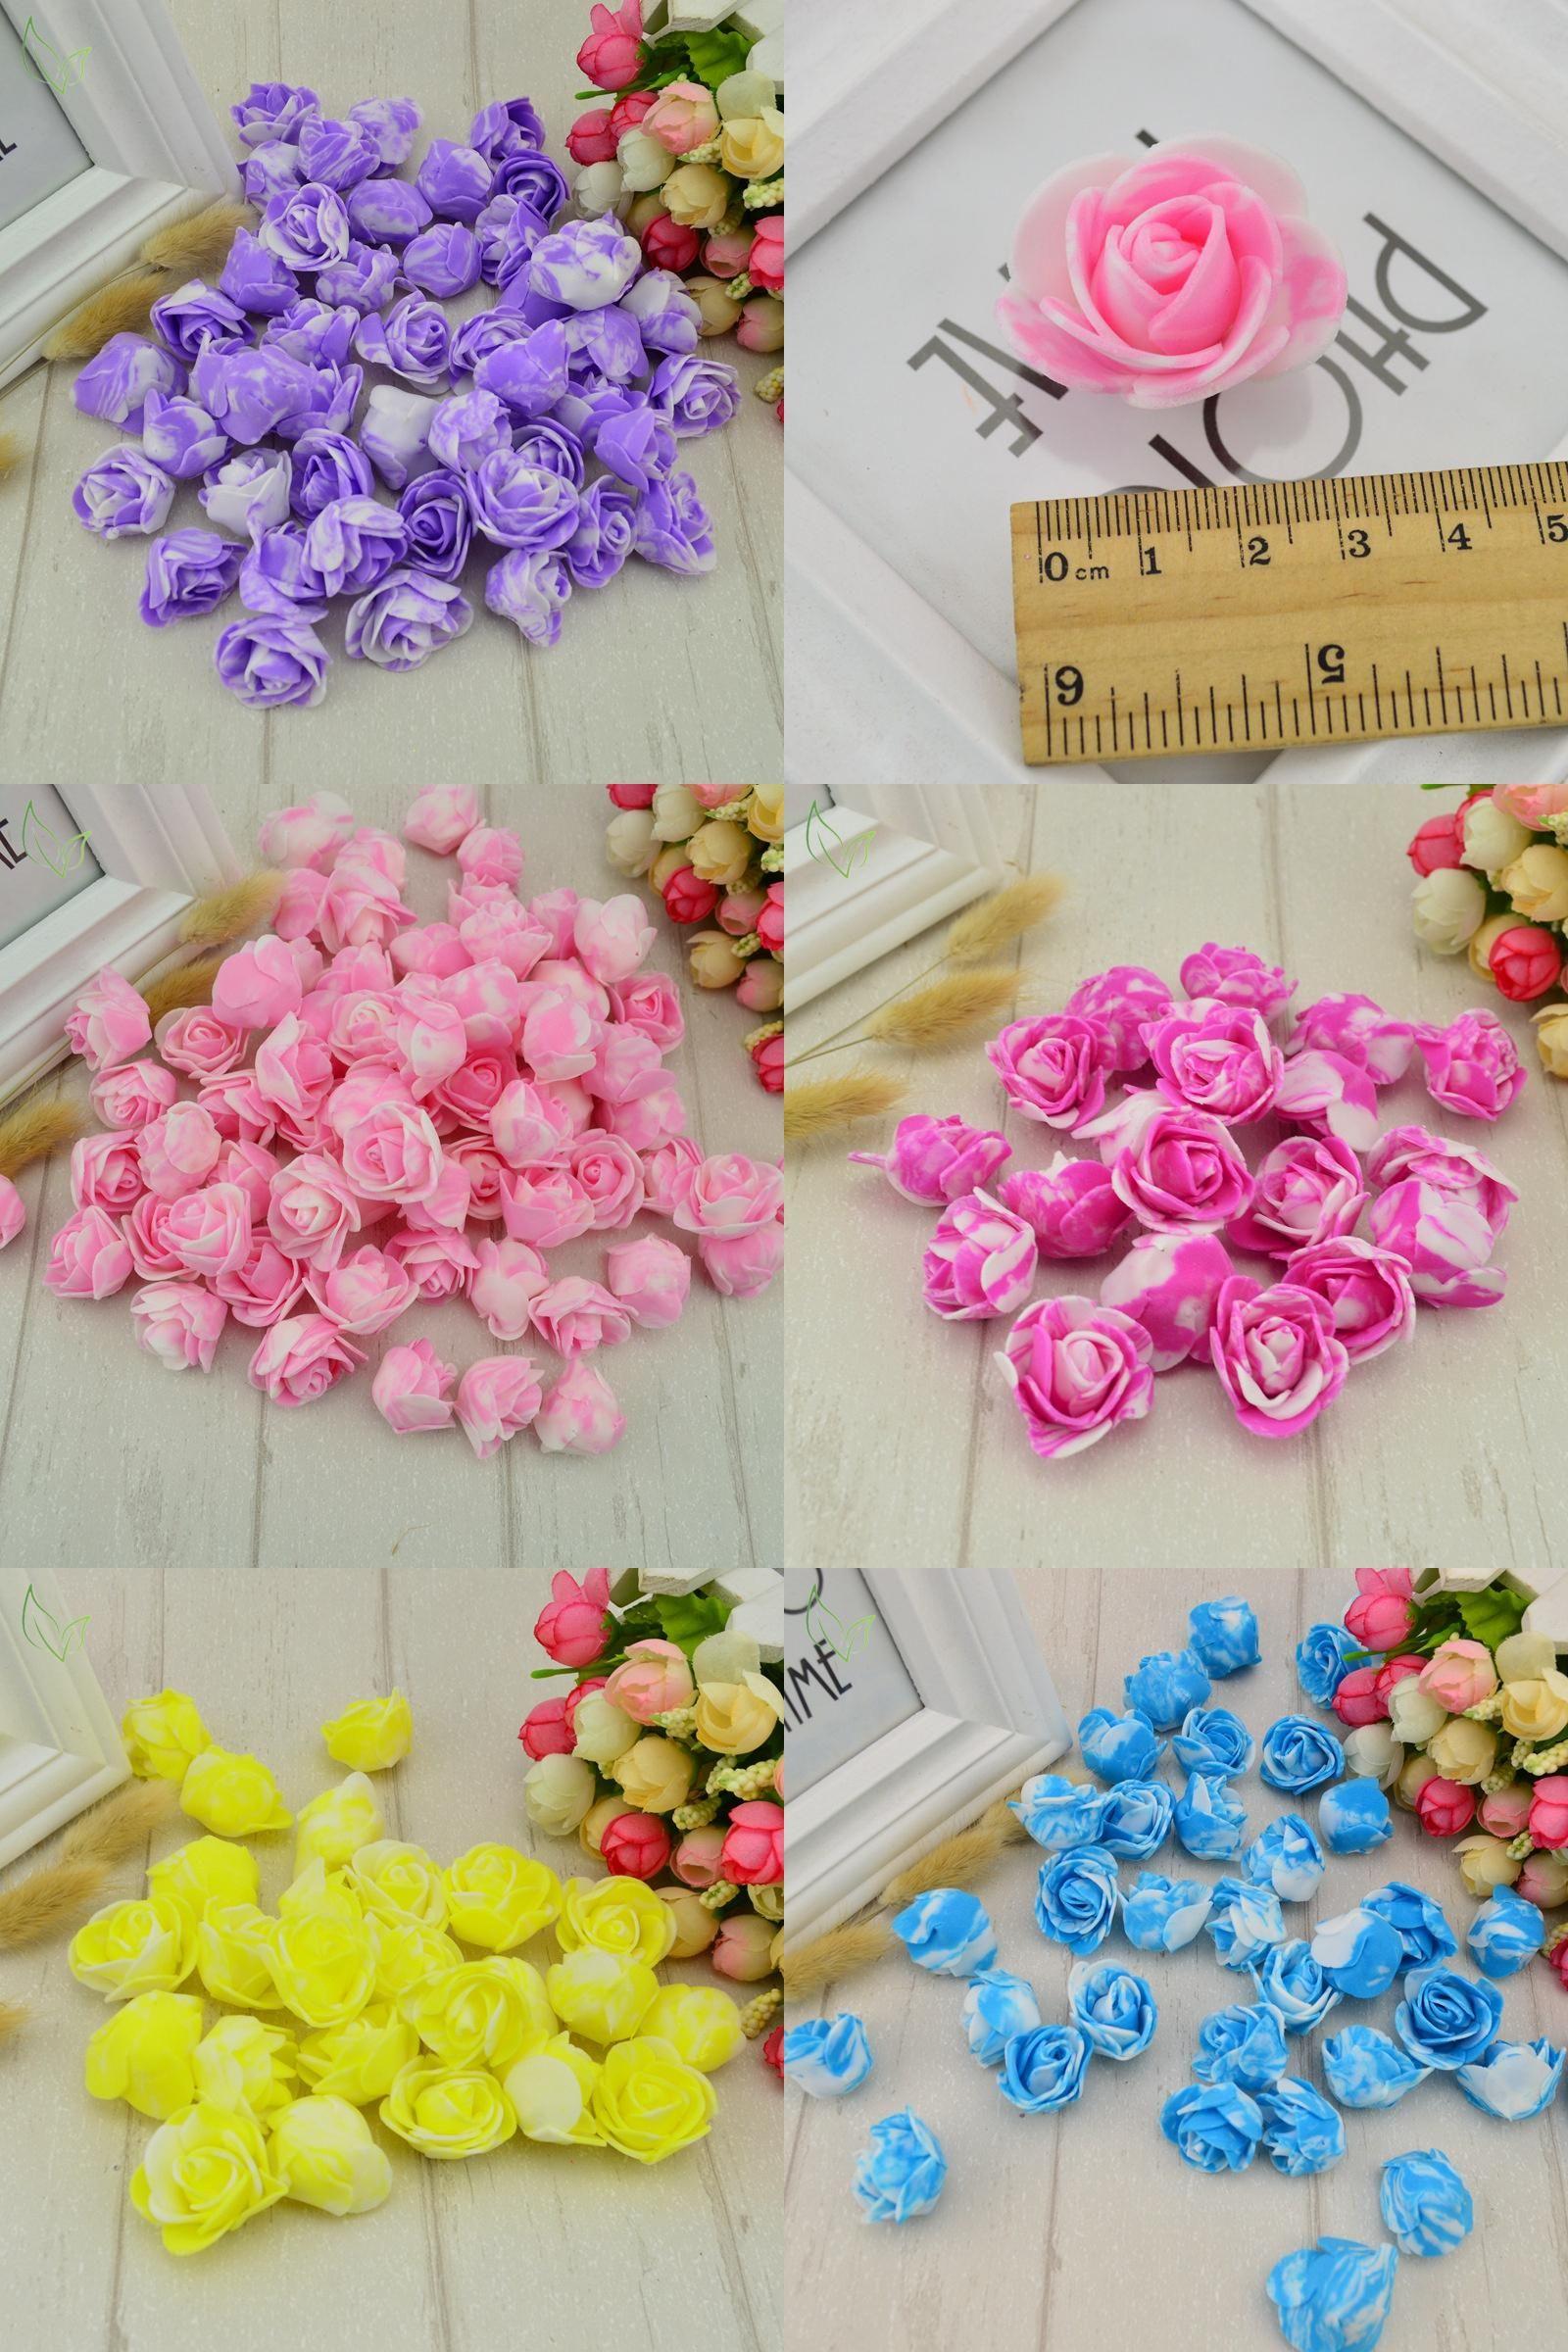 Visit To Buy 30 Pcs Pe Foam Fake Flower Roses Head Artificial